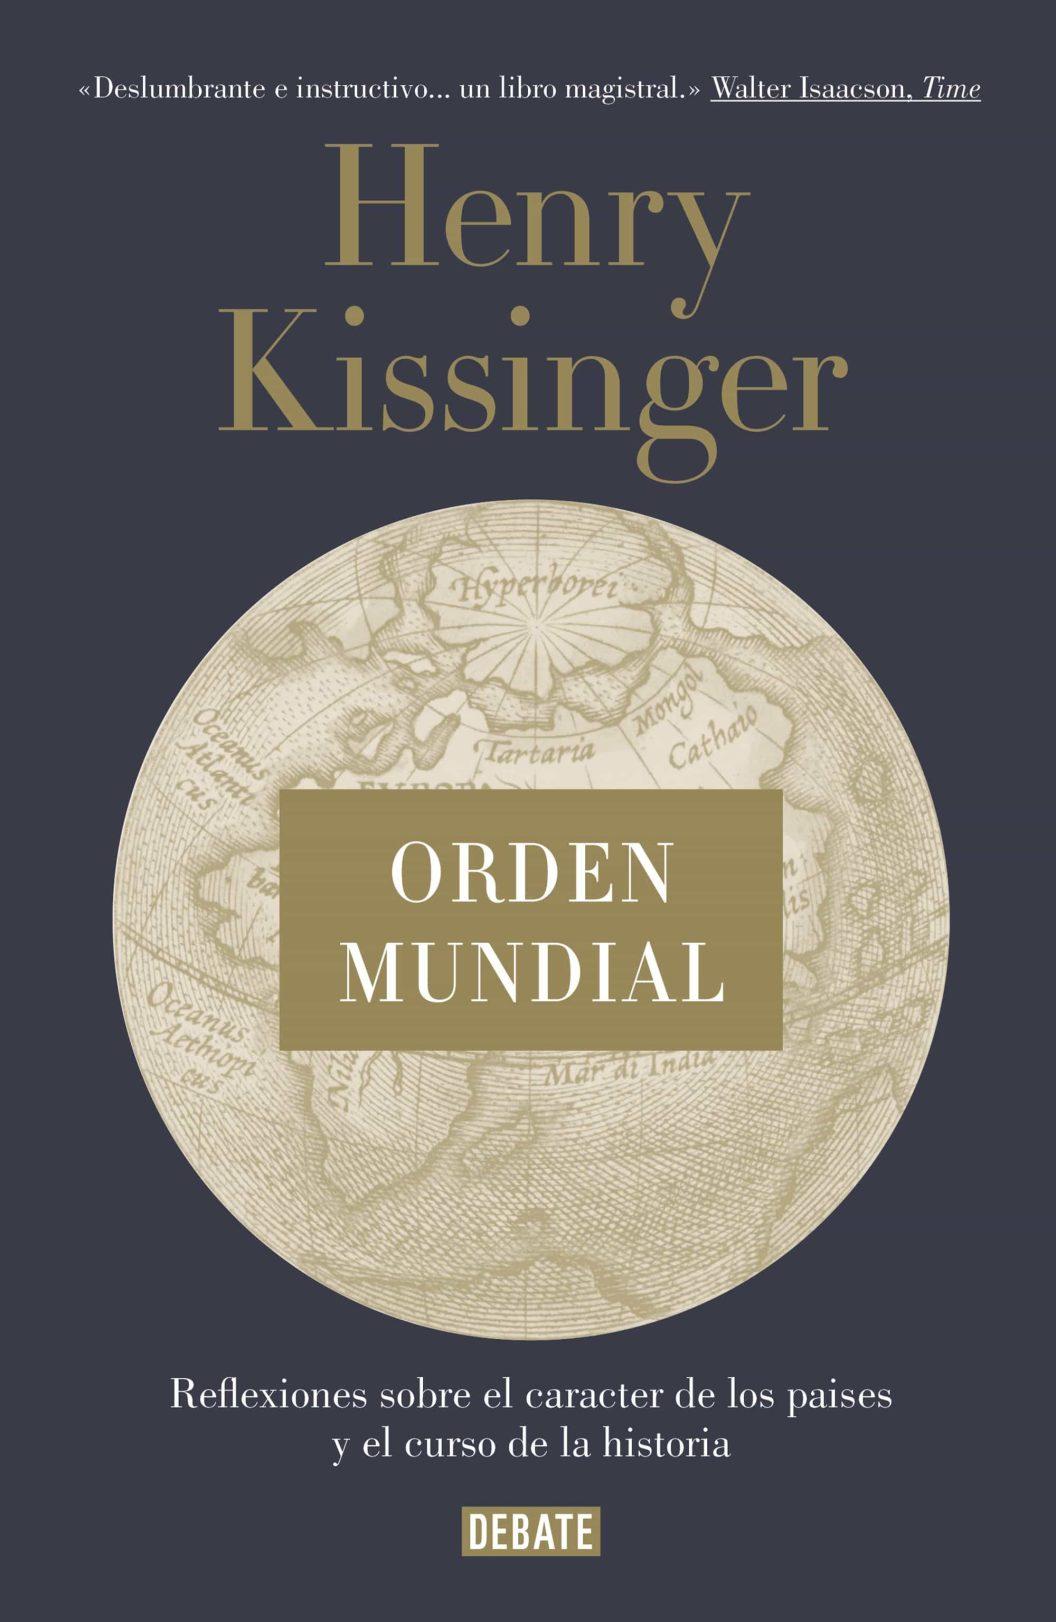 Resultado de imagen para orden mundial kissinger